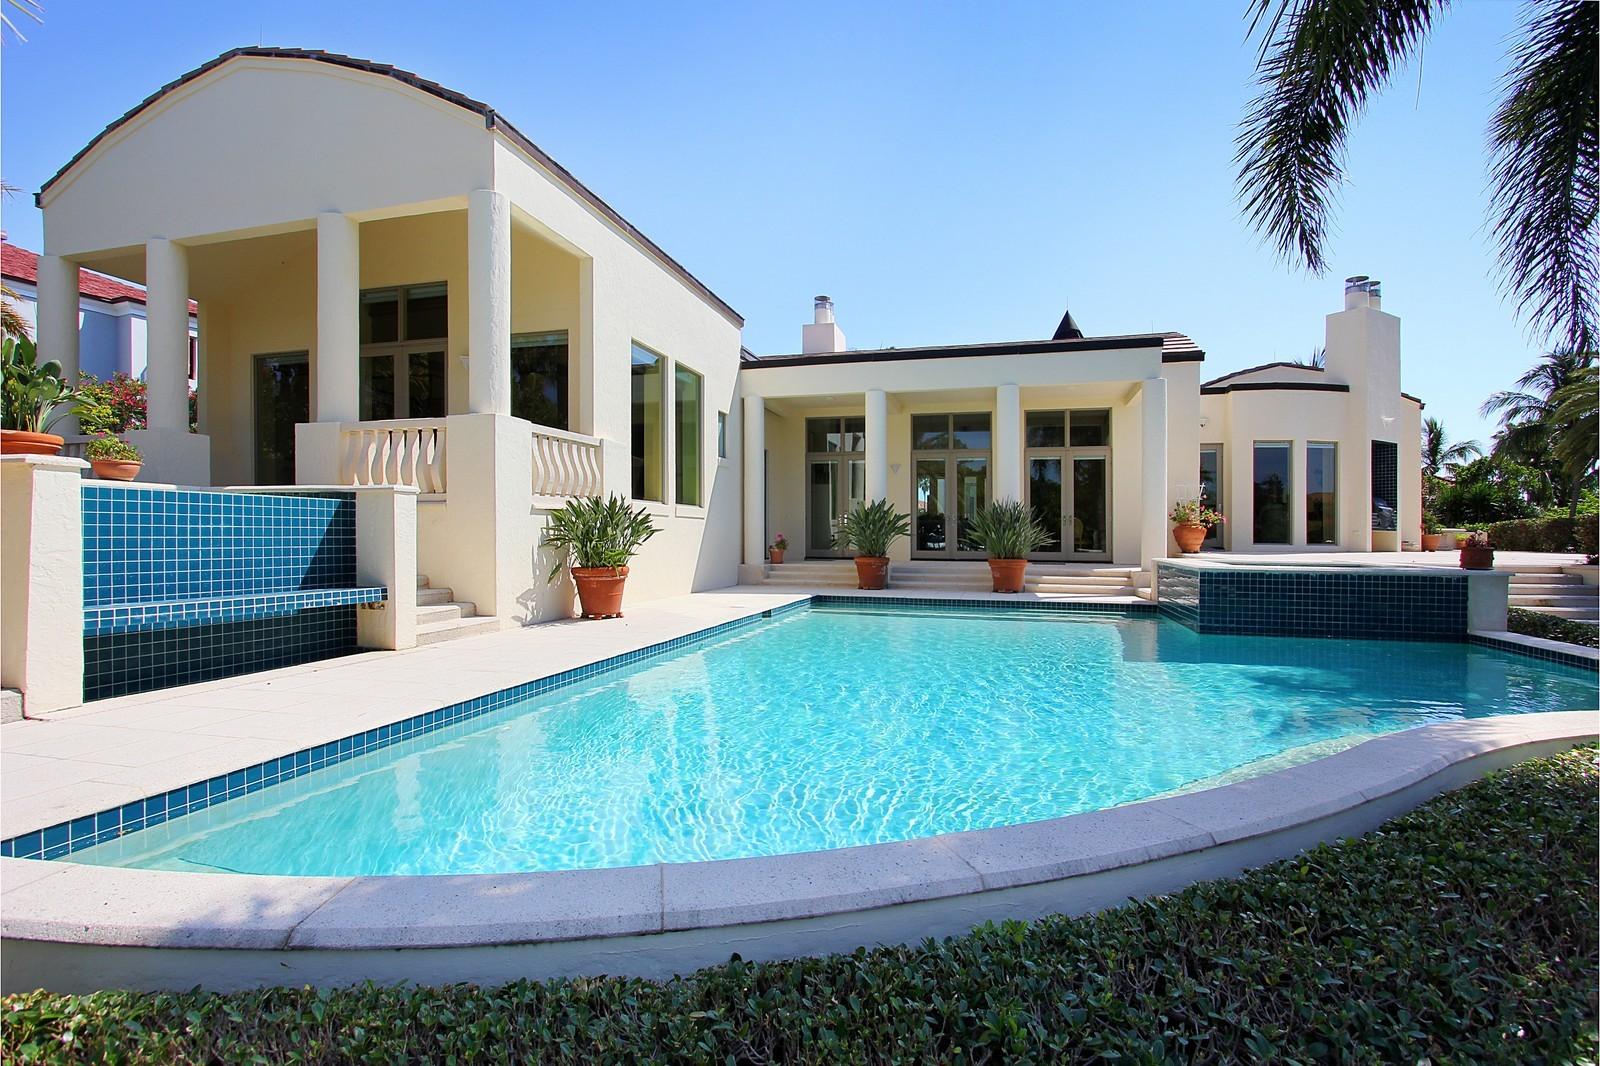 Real Estate Photography - 6814 SE Isle Way, Stuart, FL, 34996 - Exterior Back